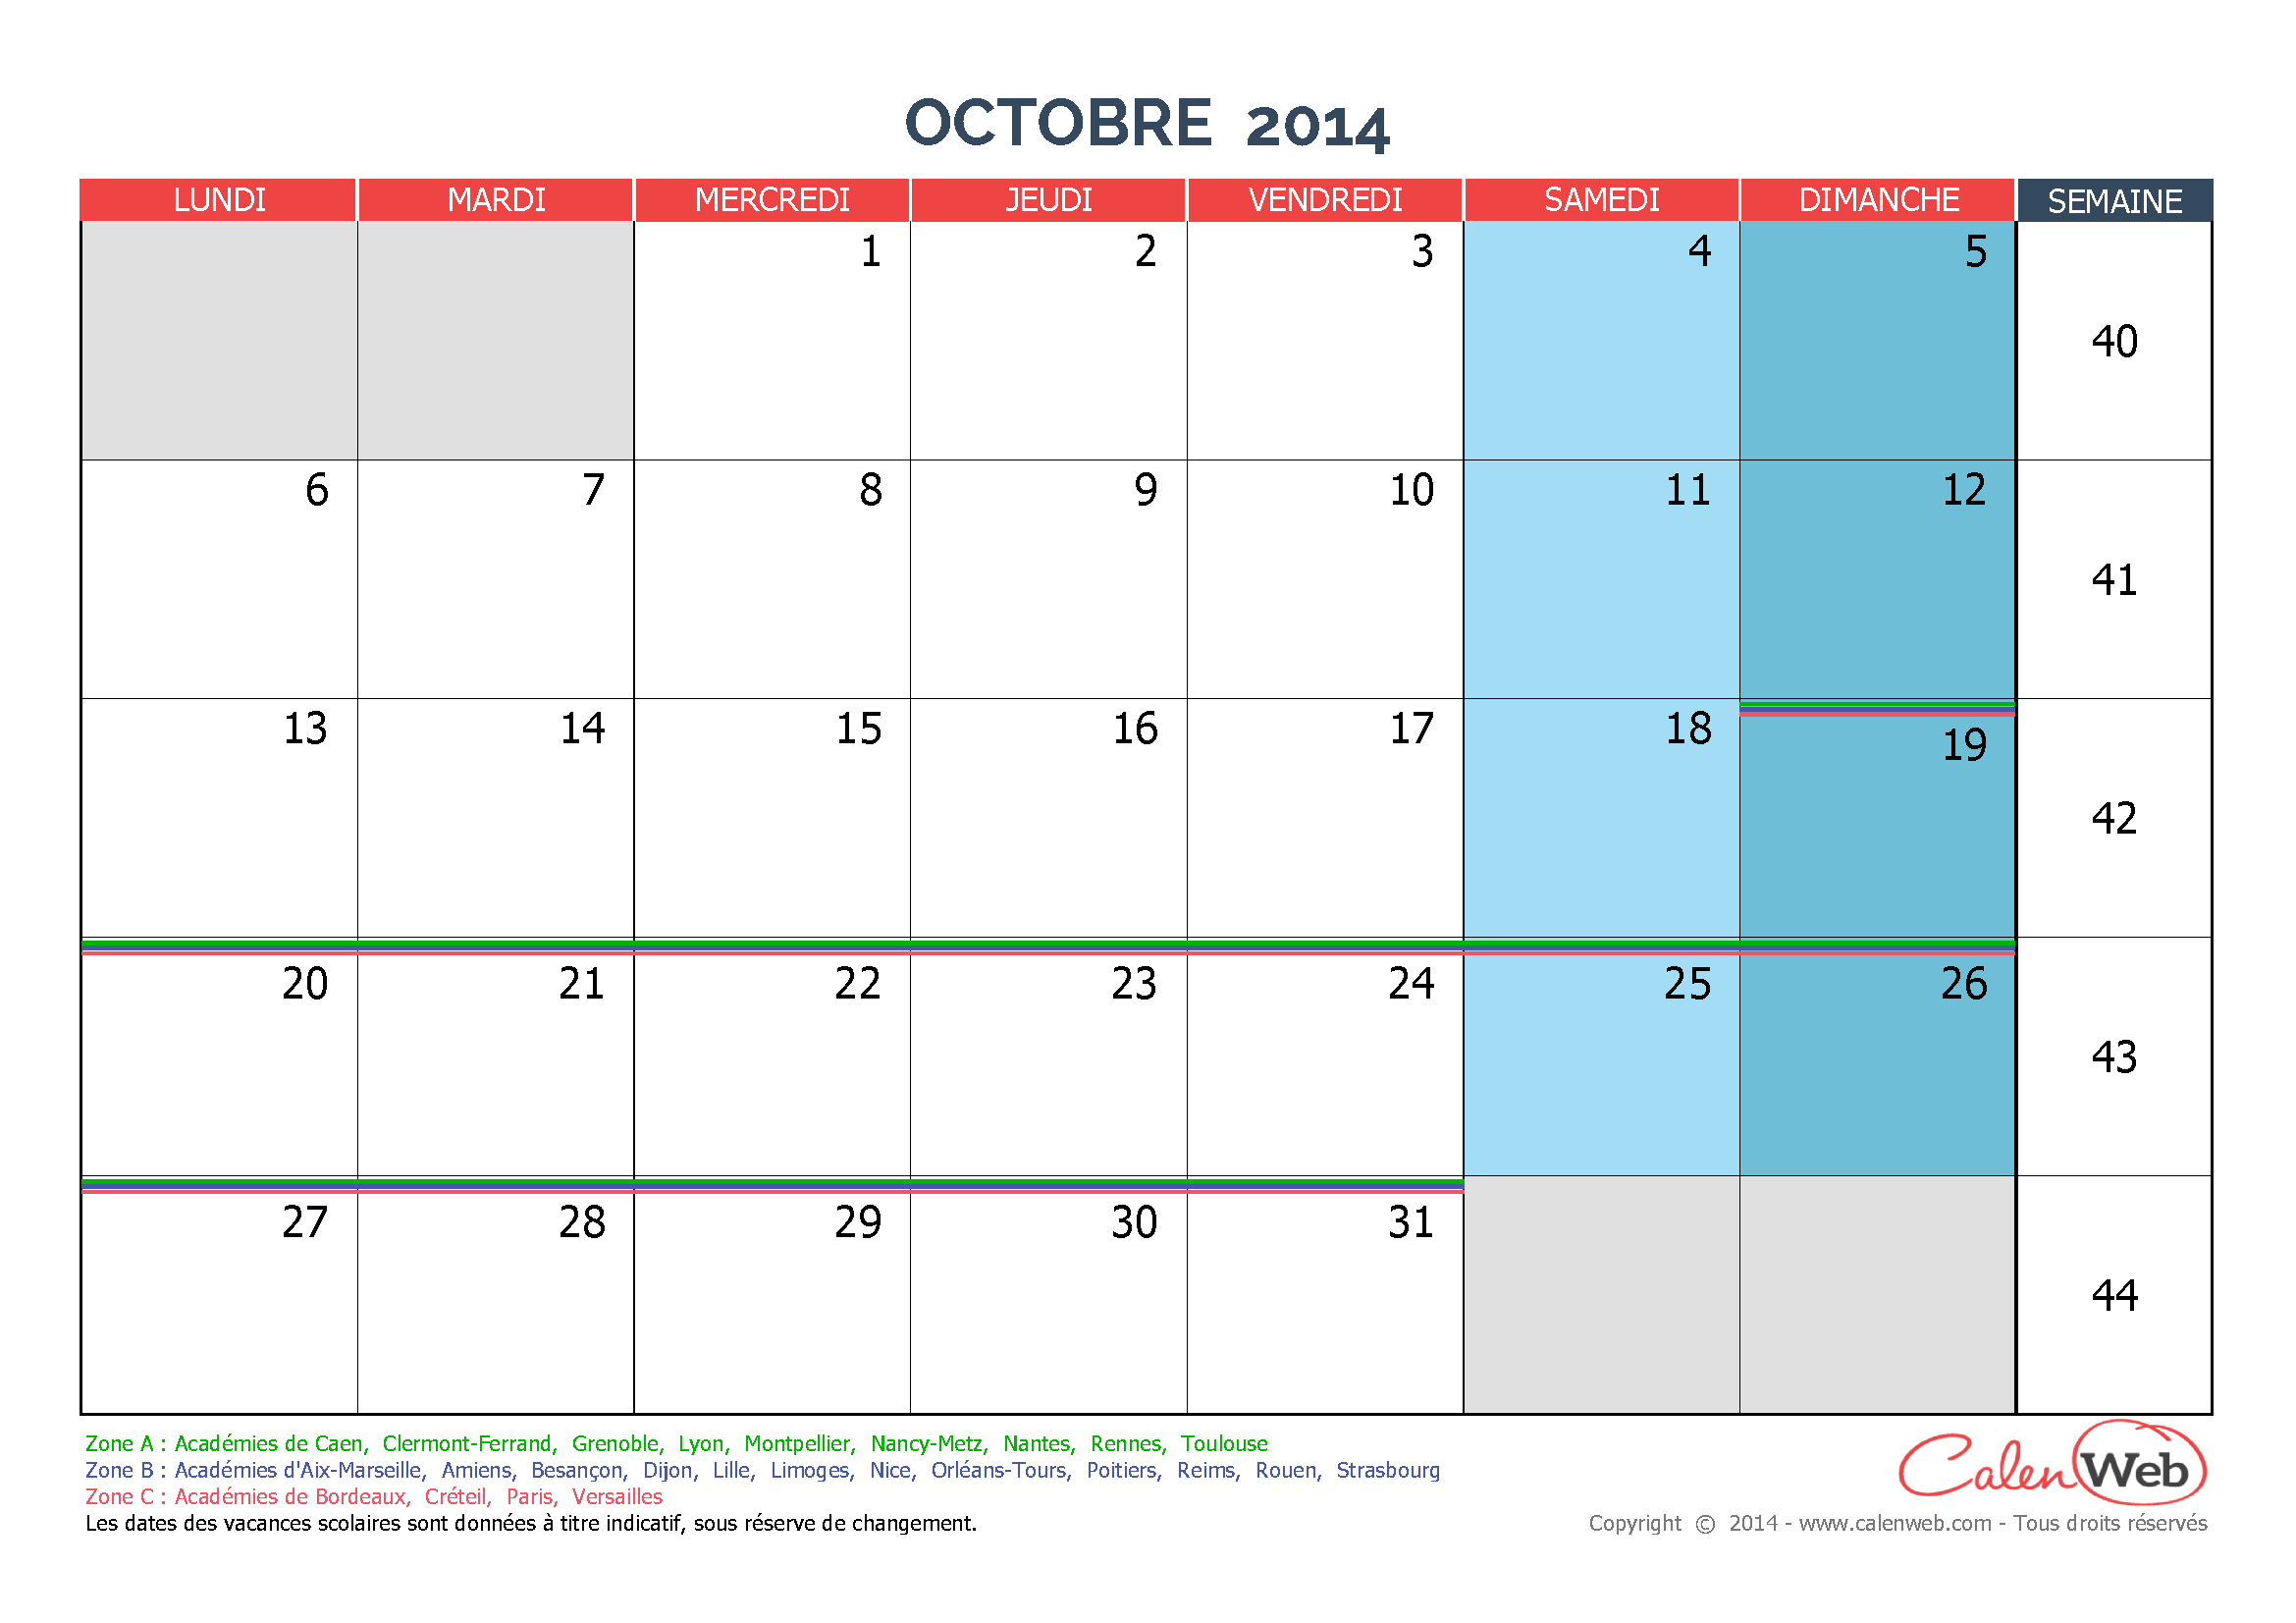 Calendrier Mensuel Mois D 39 Octobre 2014 Avec Jours F Ri S